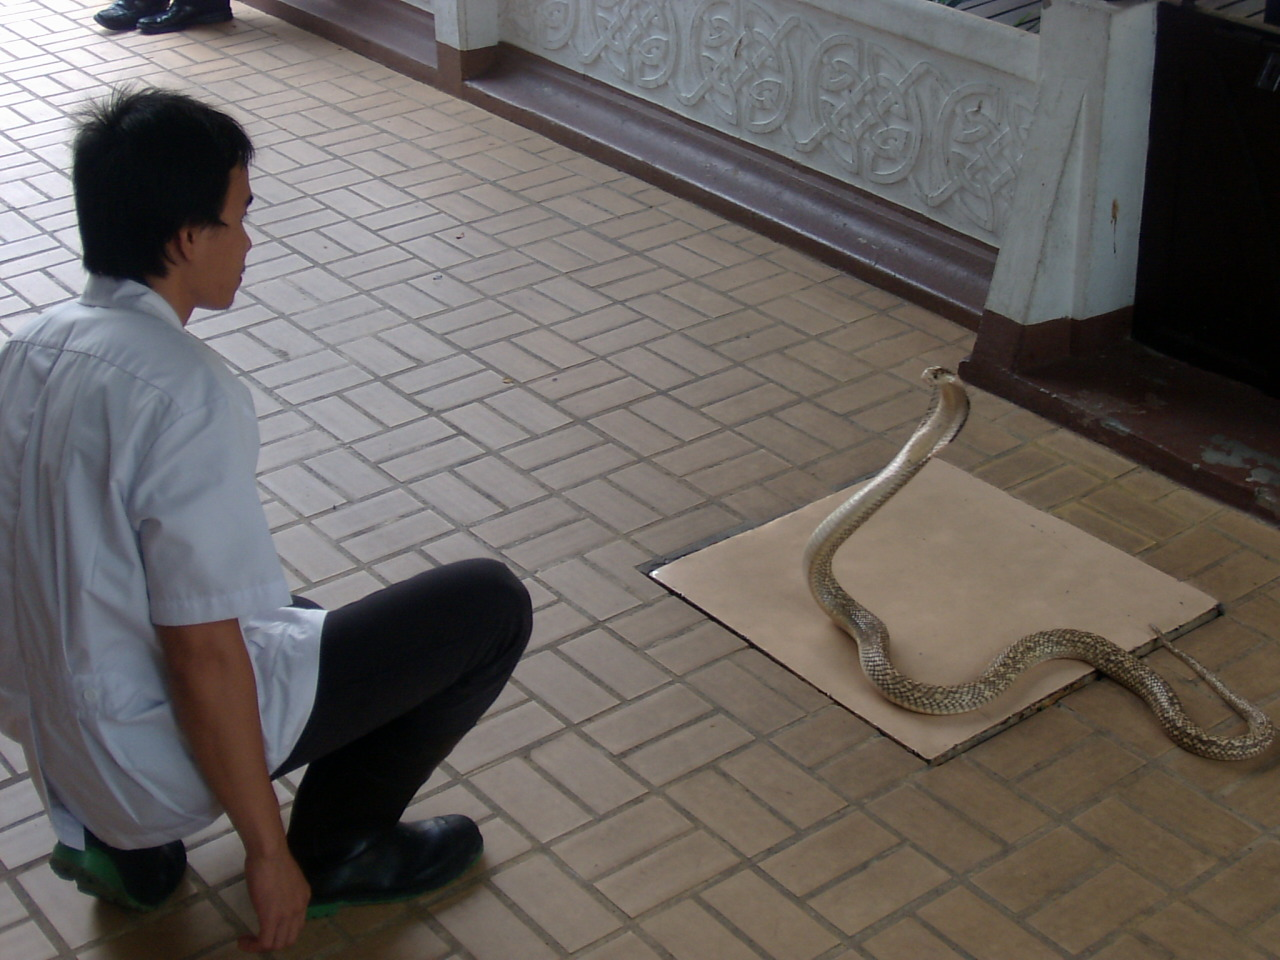 Bangkok Snake Farm - Visit to a snake farm in Bangkok